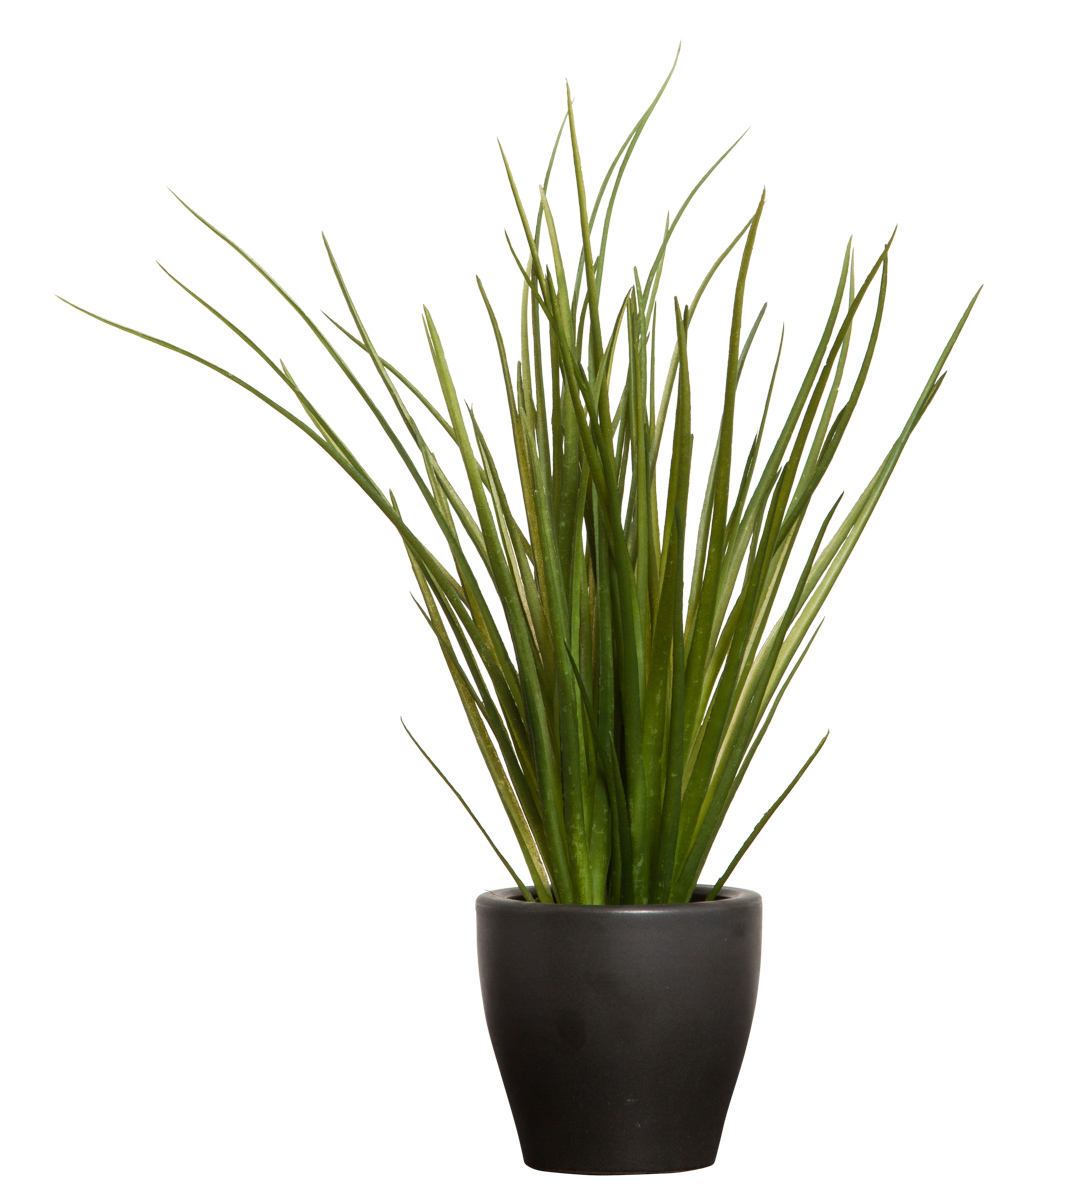 GRASS IN BLACK POT